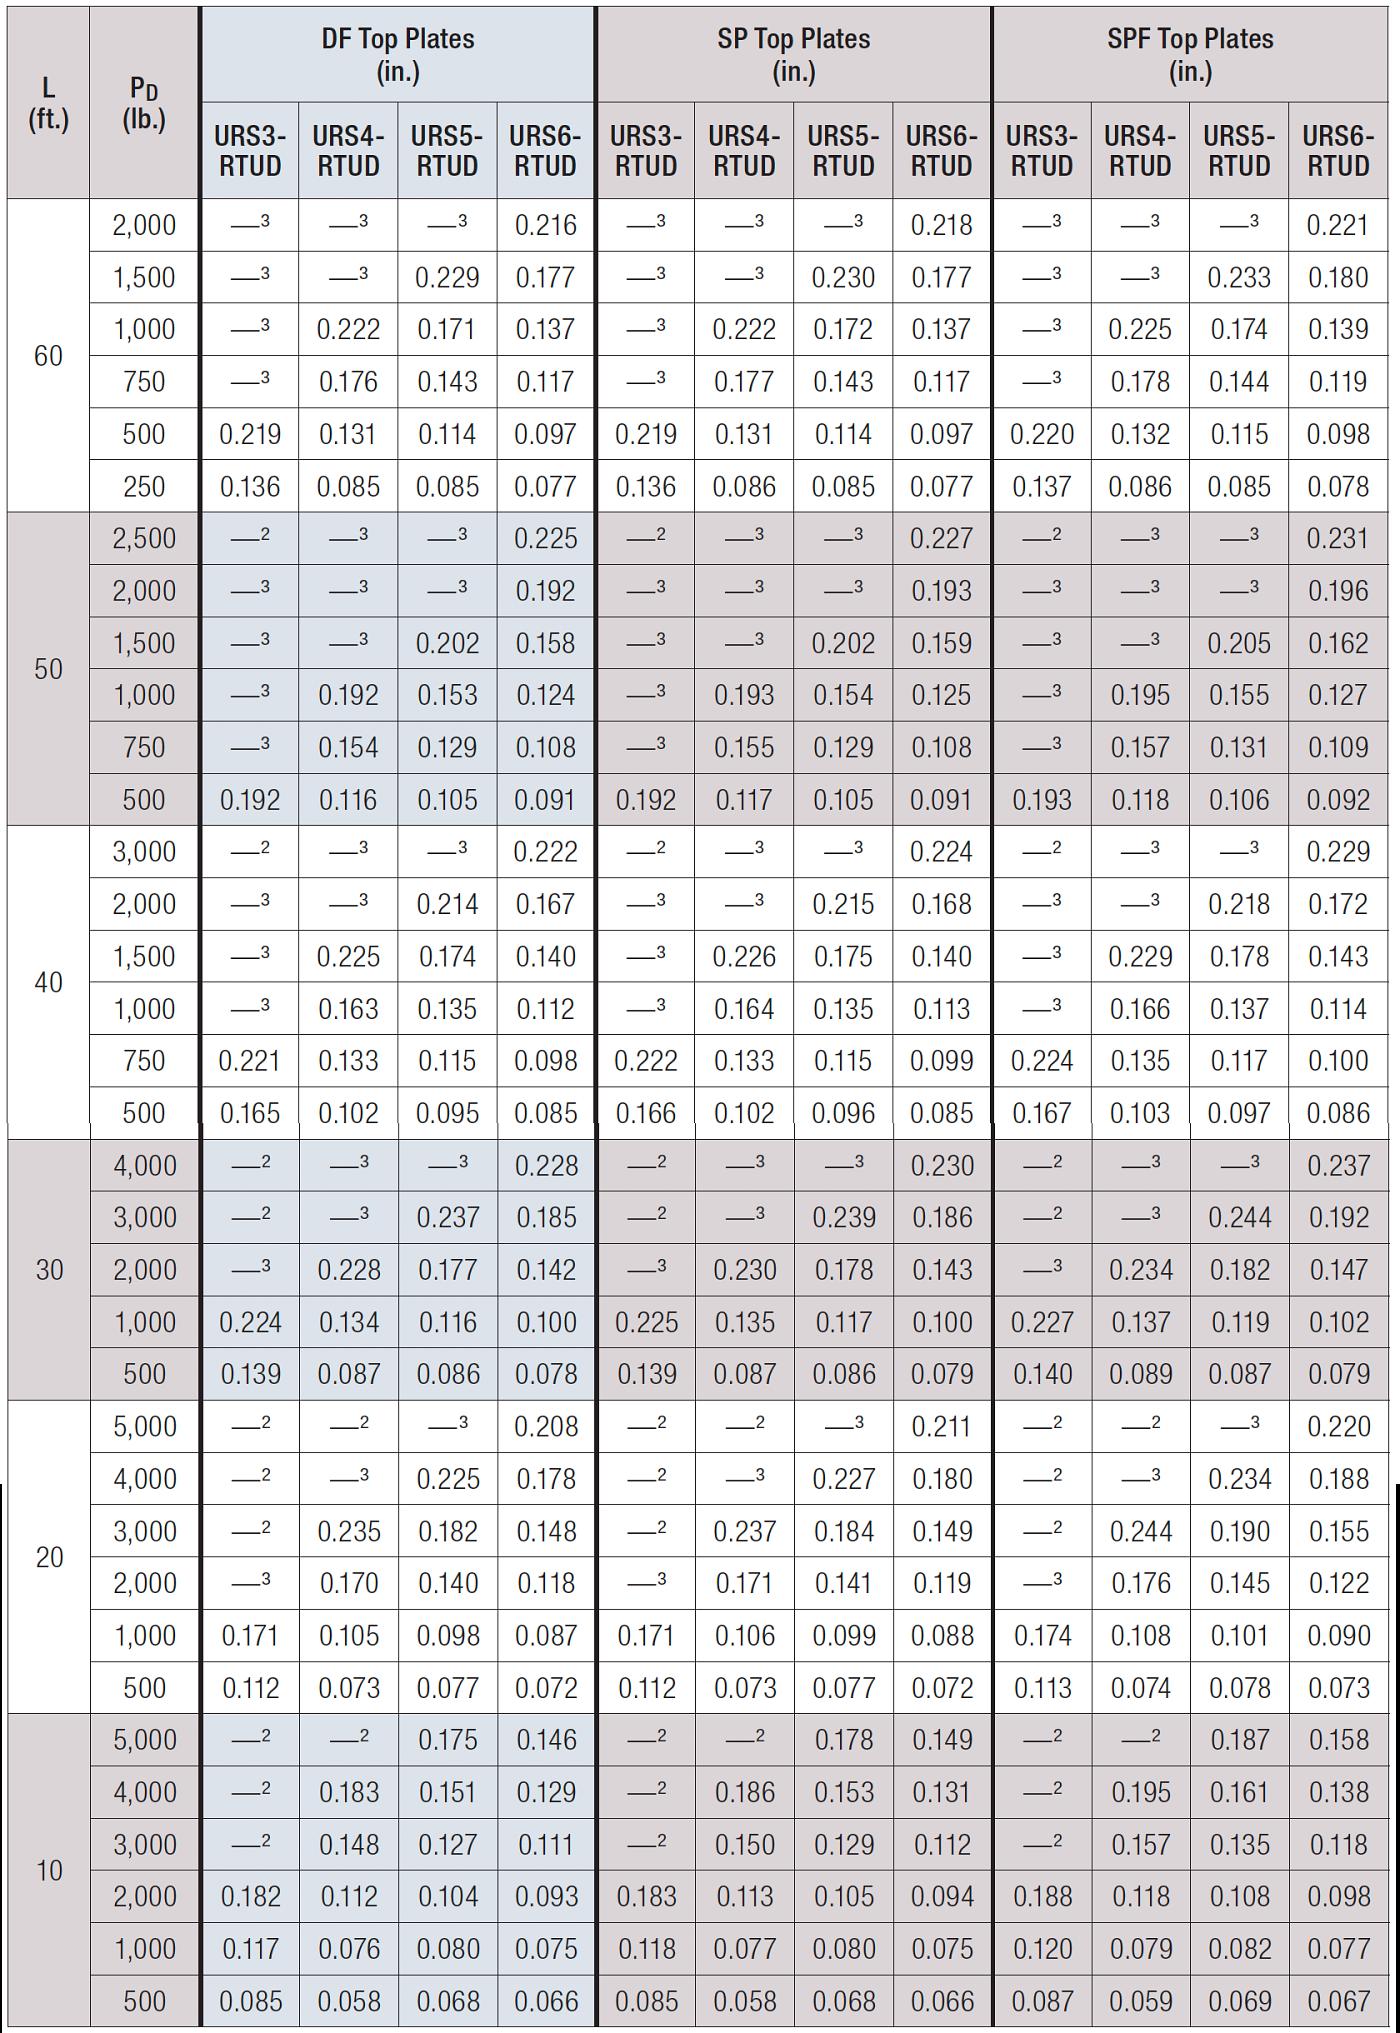 Table 3 – Tabulated Deflection Tables Using RTUD